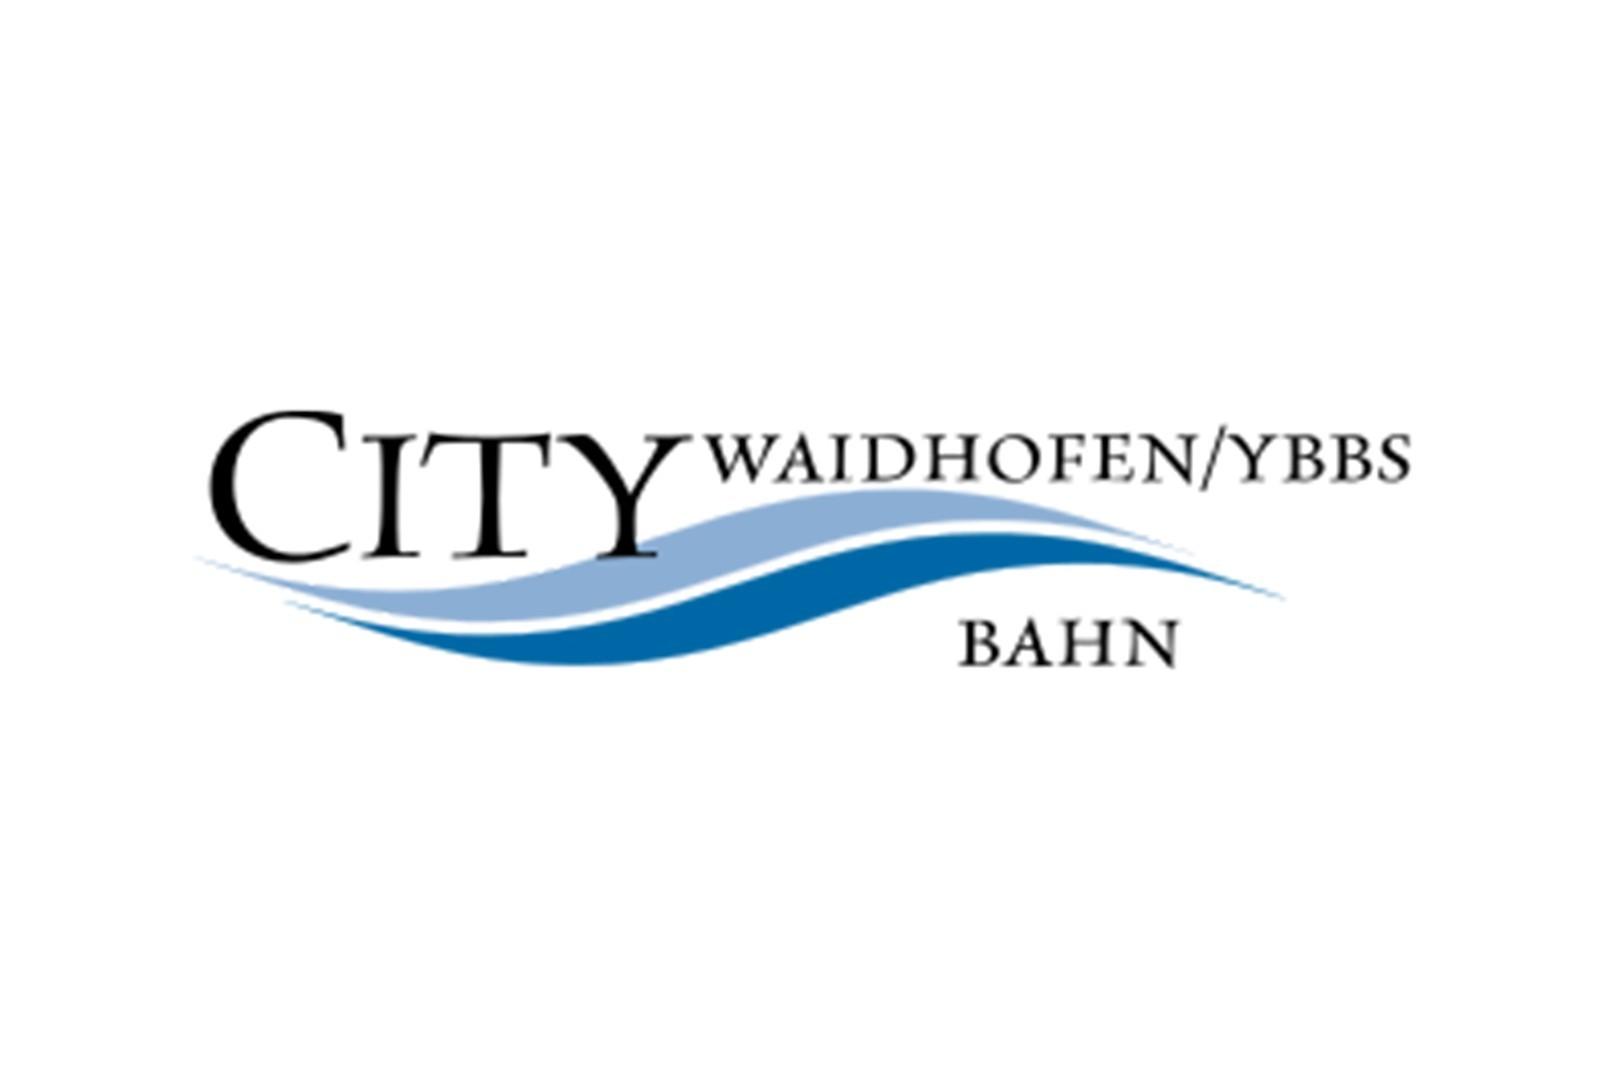 City_Waidhofen_Ybbs_Bahnjpg.jpg